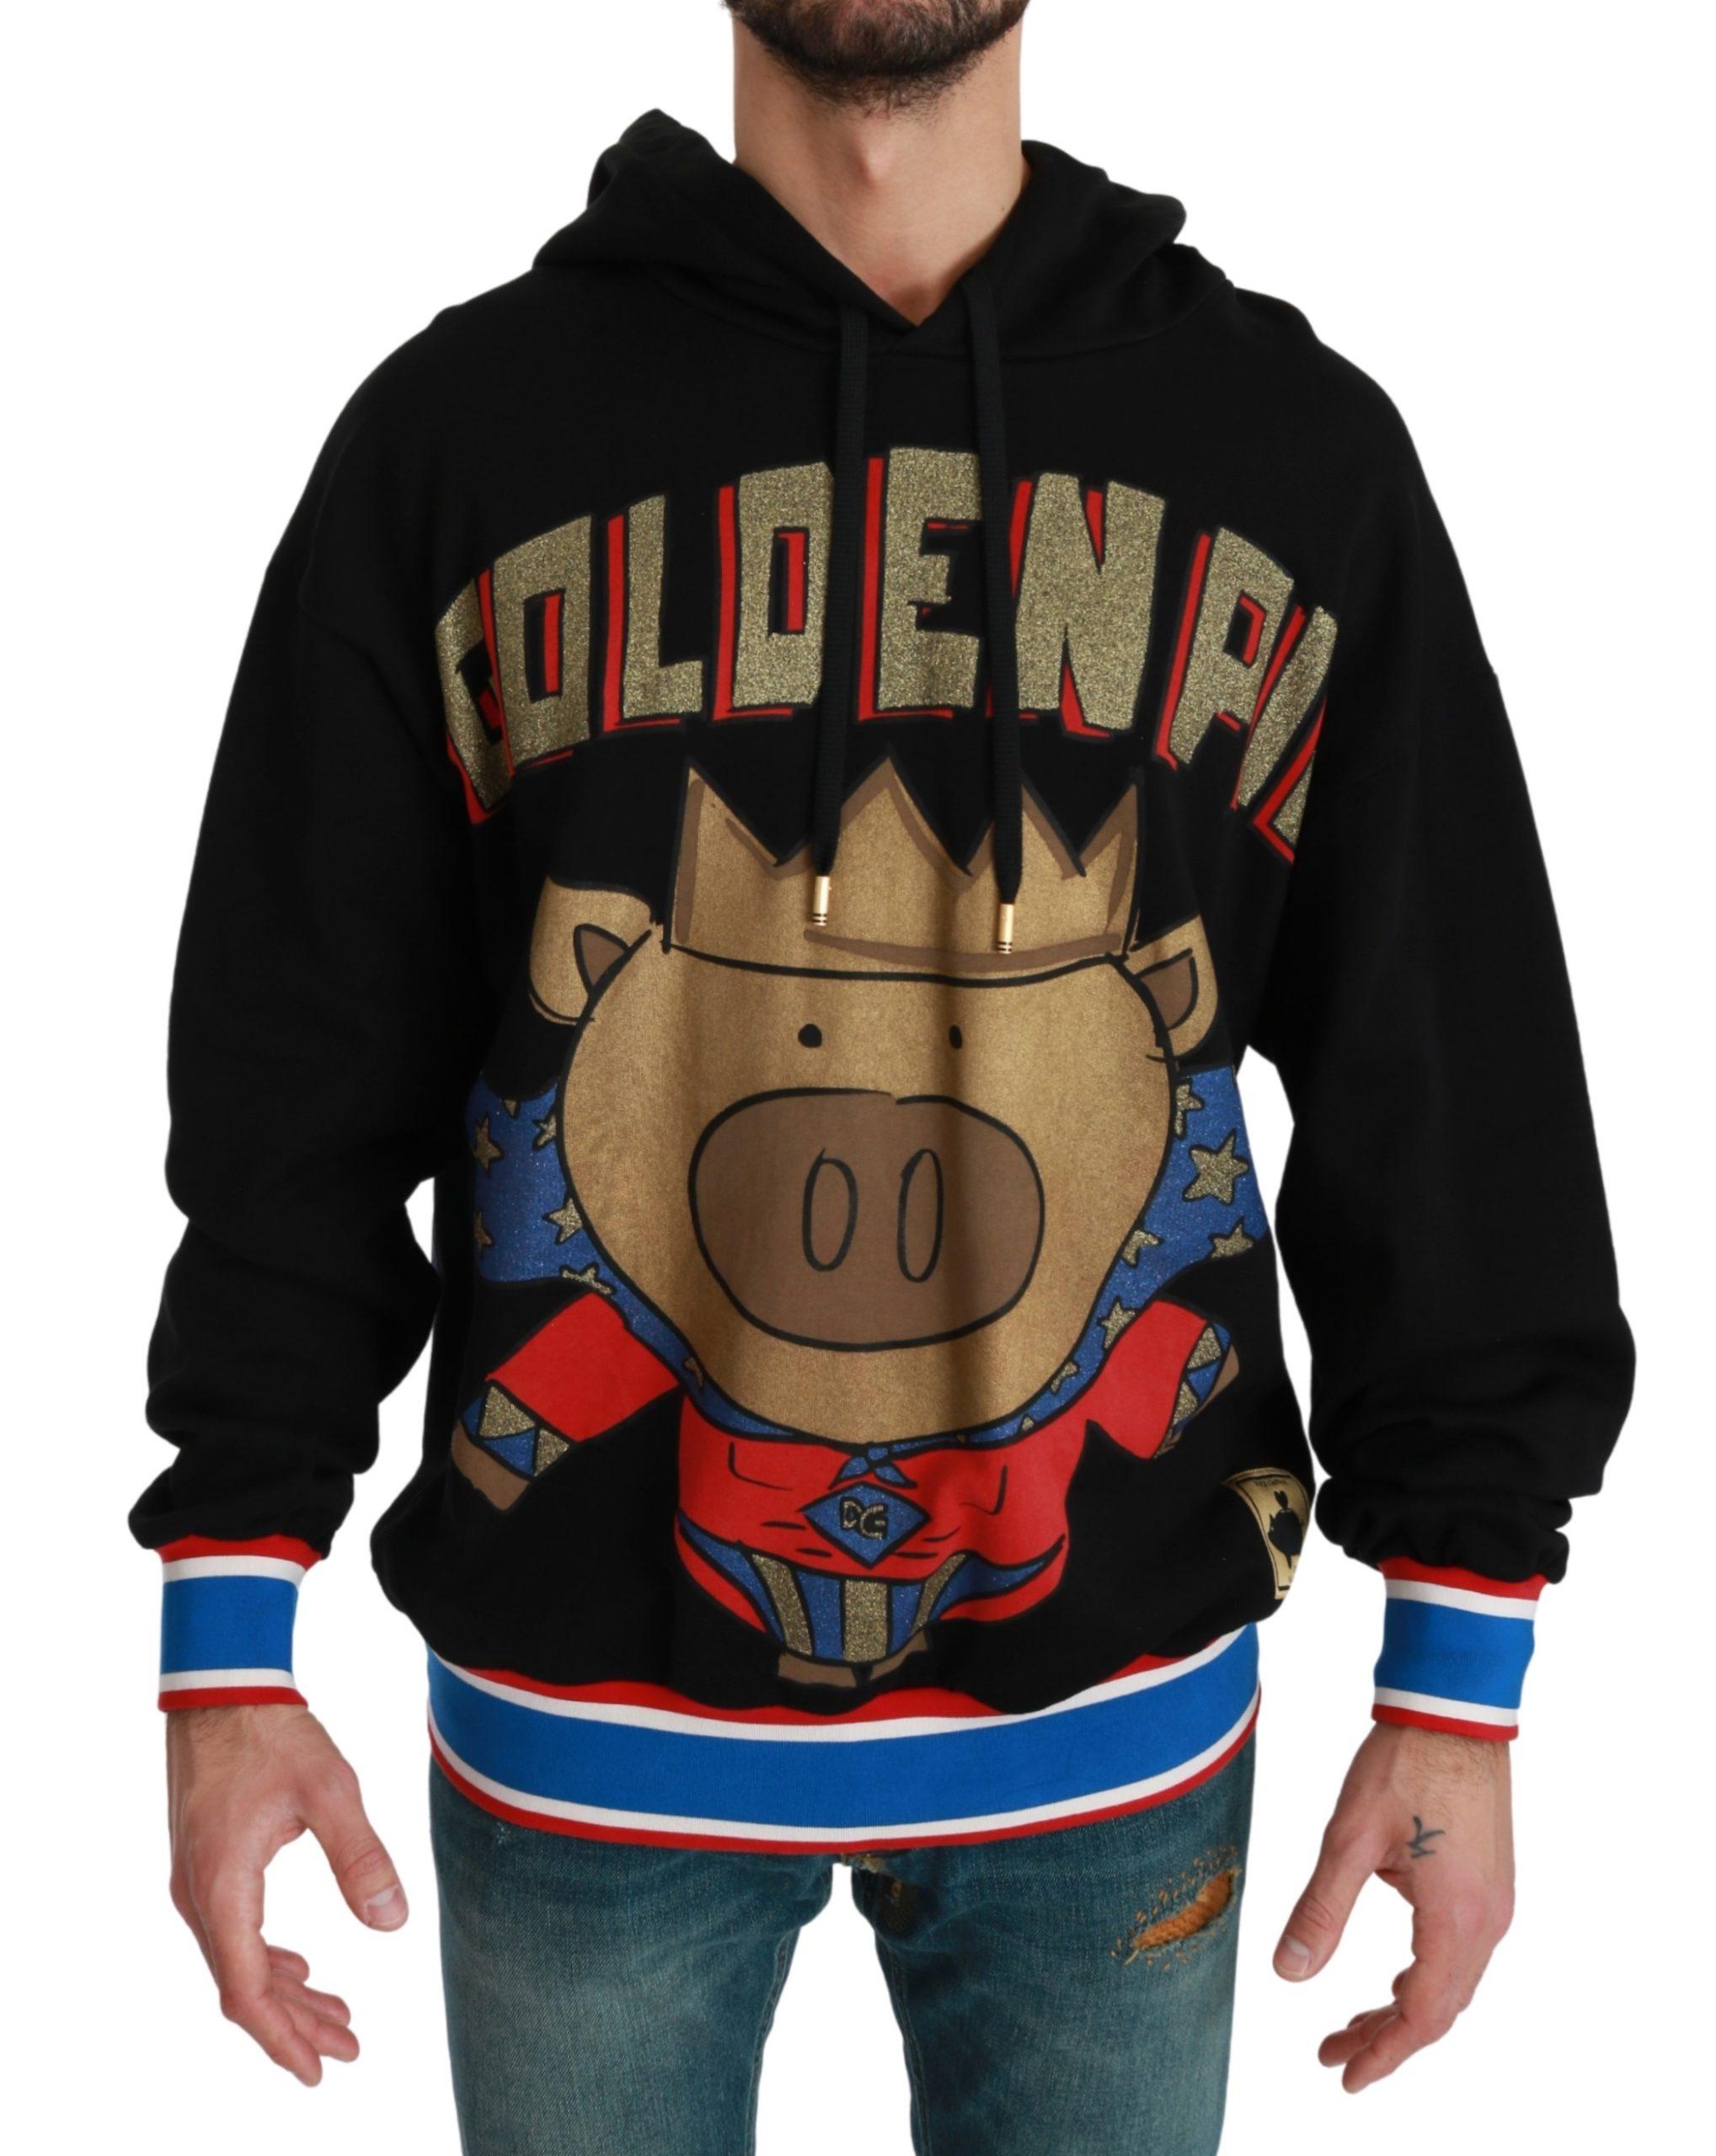 Dolce & Gabbana Men's Sweater Pig of the Year Sweater Black TSH4613 - IT44 | XS